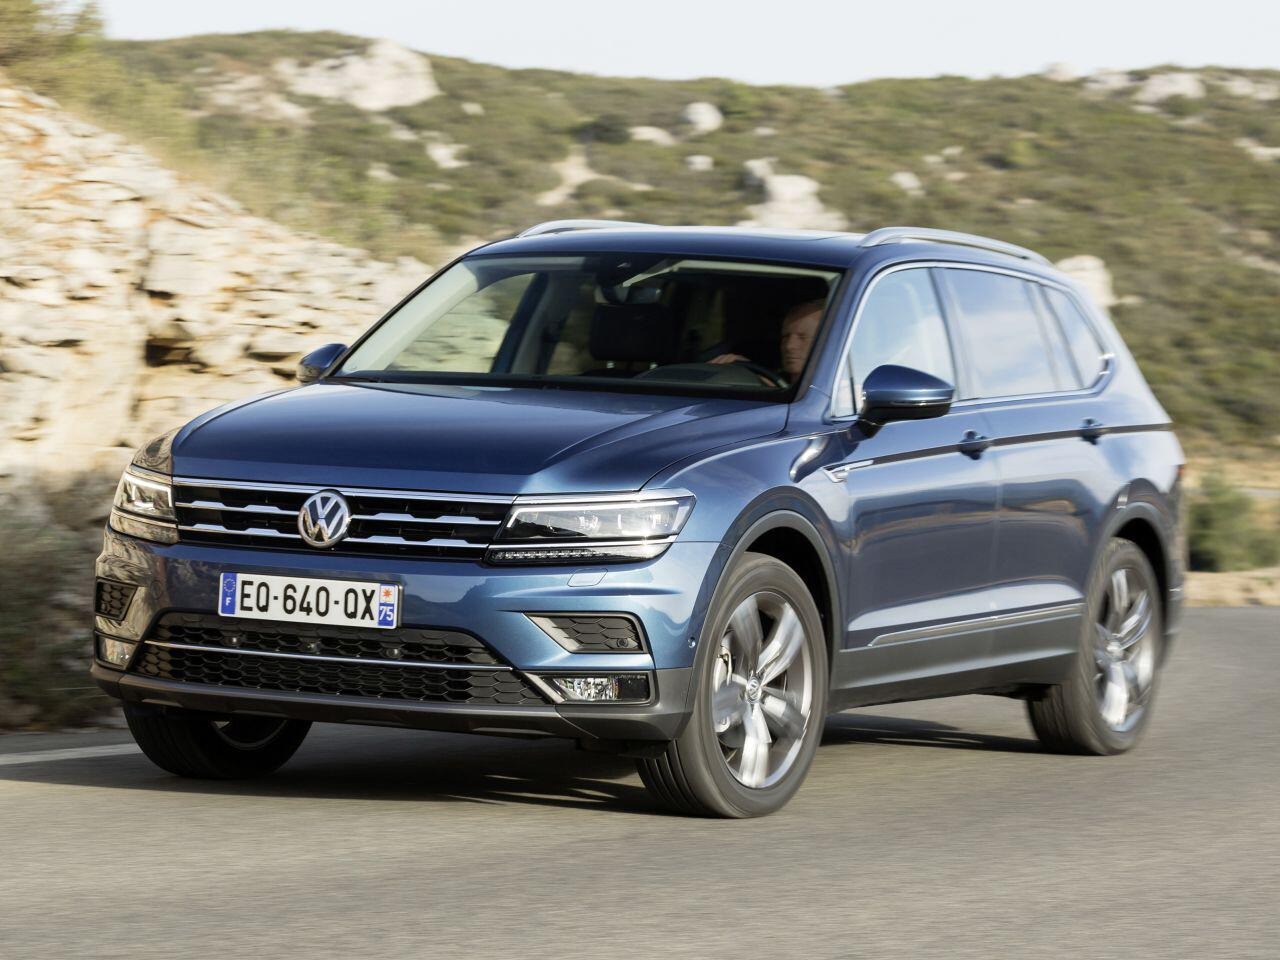 Bild zu Platz 2: VW Tiguan